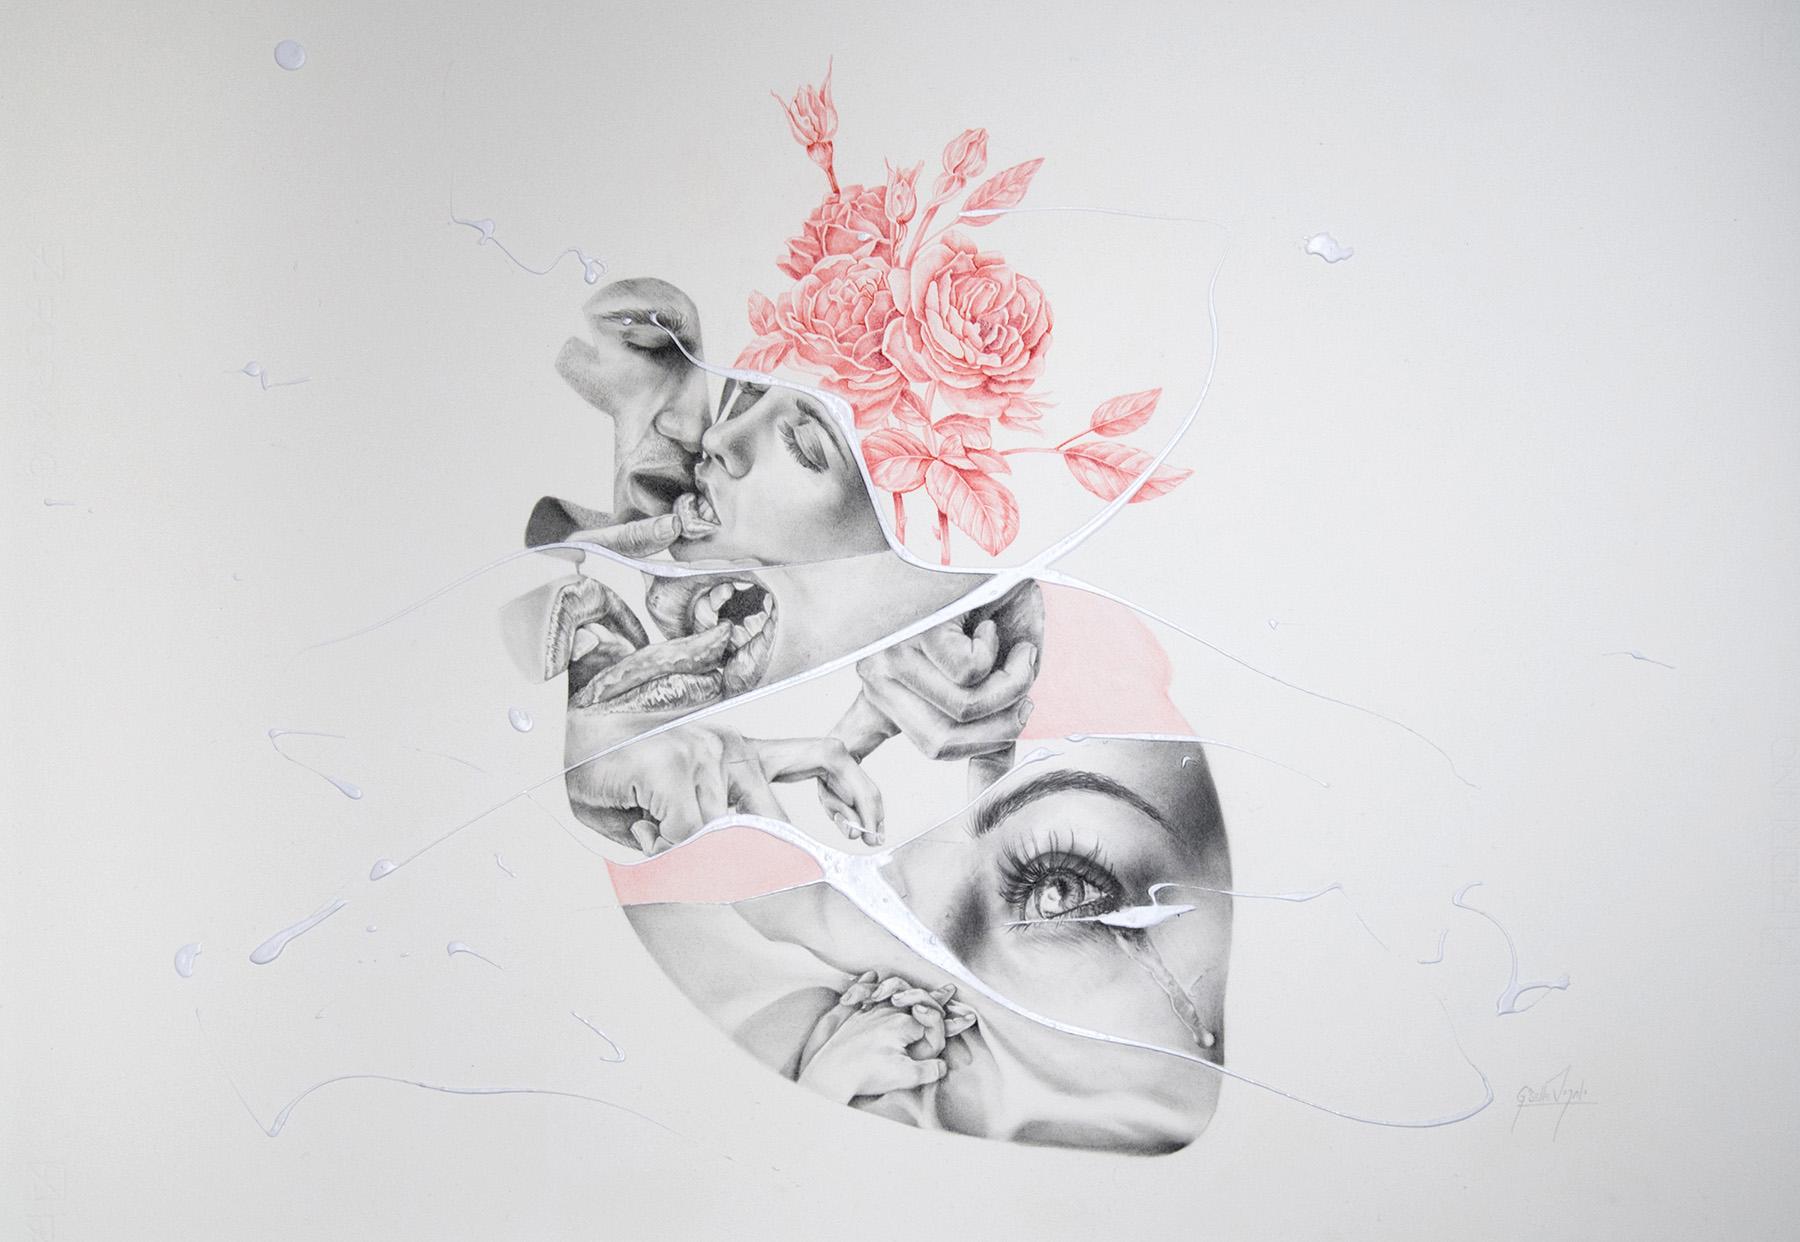 ilustracion a grafito hecha por la ilustradora giselle vitali